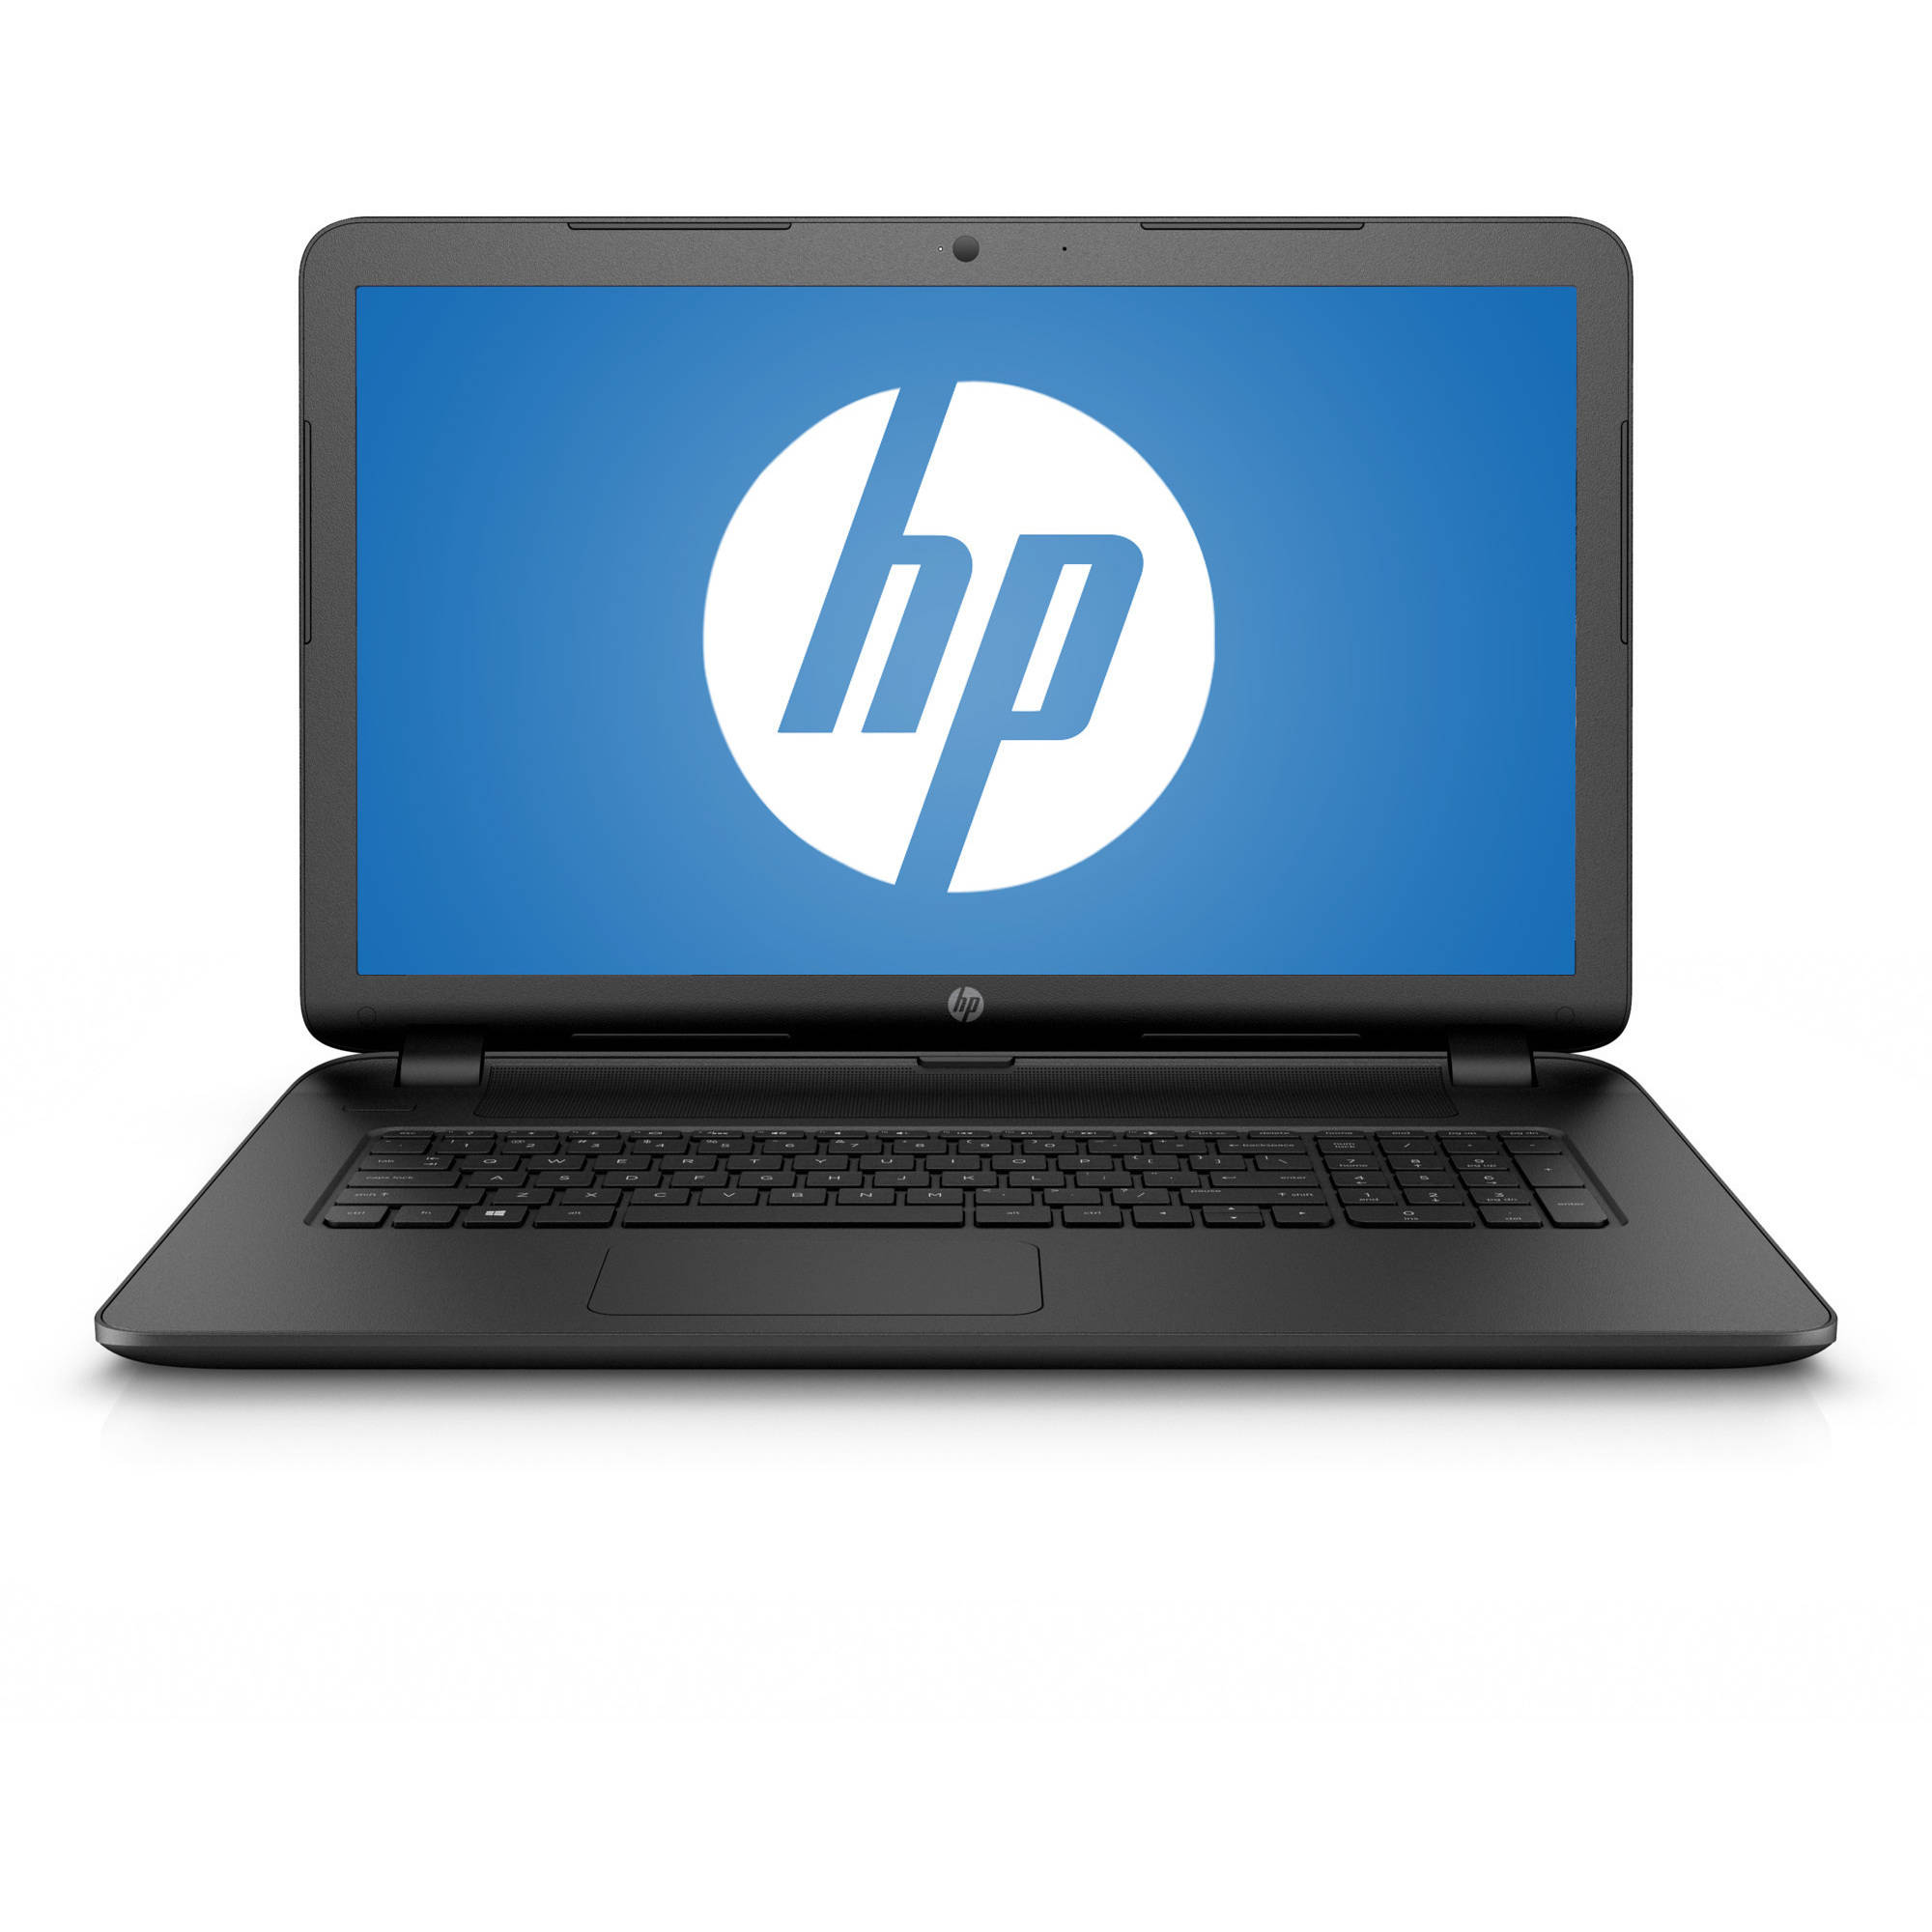 HP Black 17.3